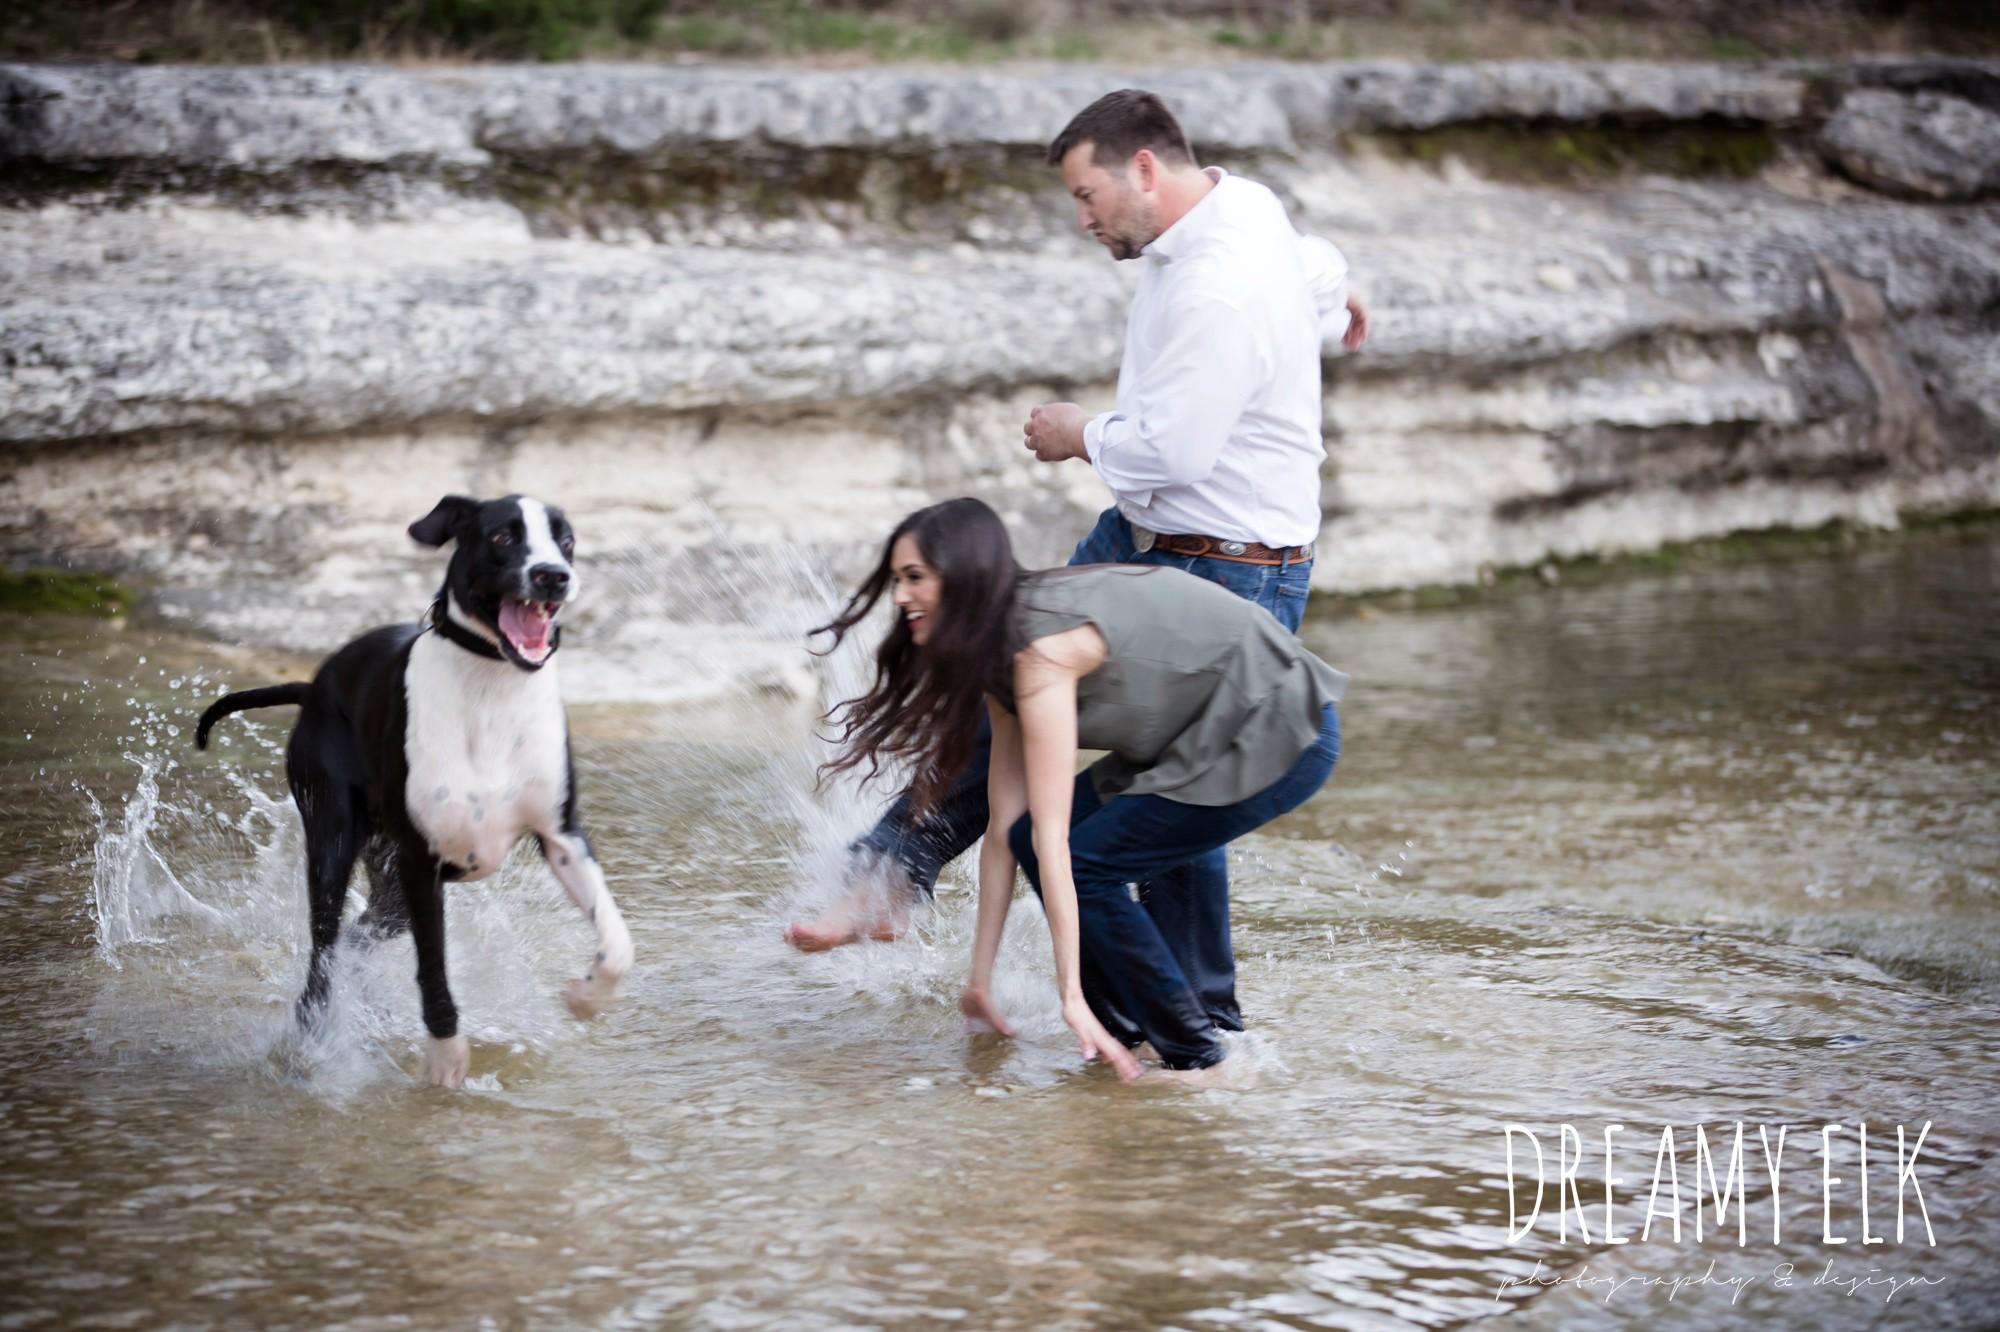 great dane, fun anniversary photo shoot with dog, bull creek park, austin, texas {dreamy elk photography and design}